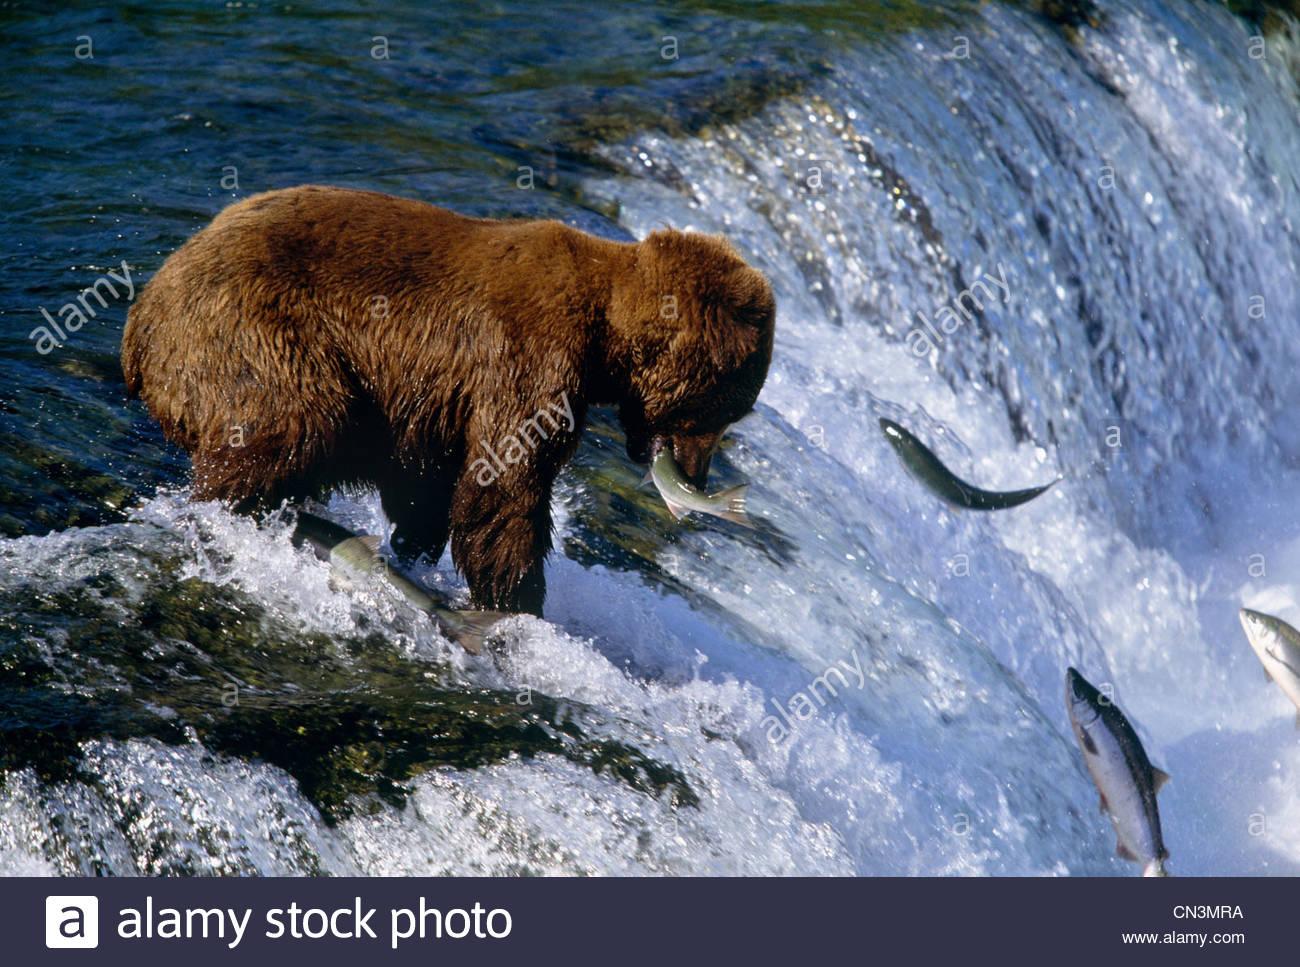 Brown bear catching salmon at brooks falls katmai for Bear catching fish